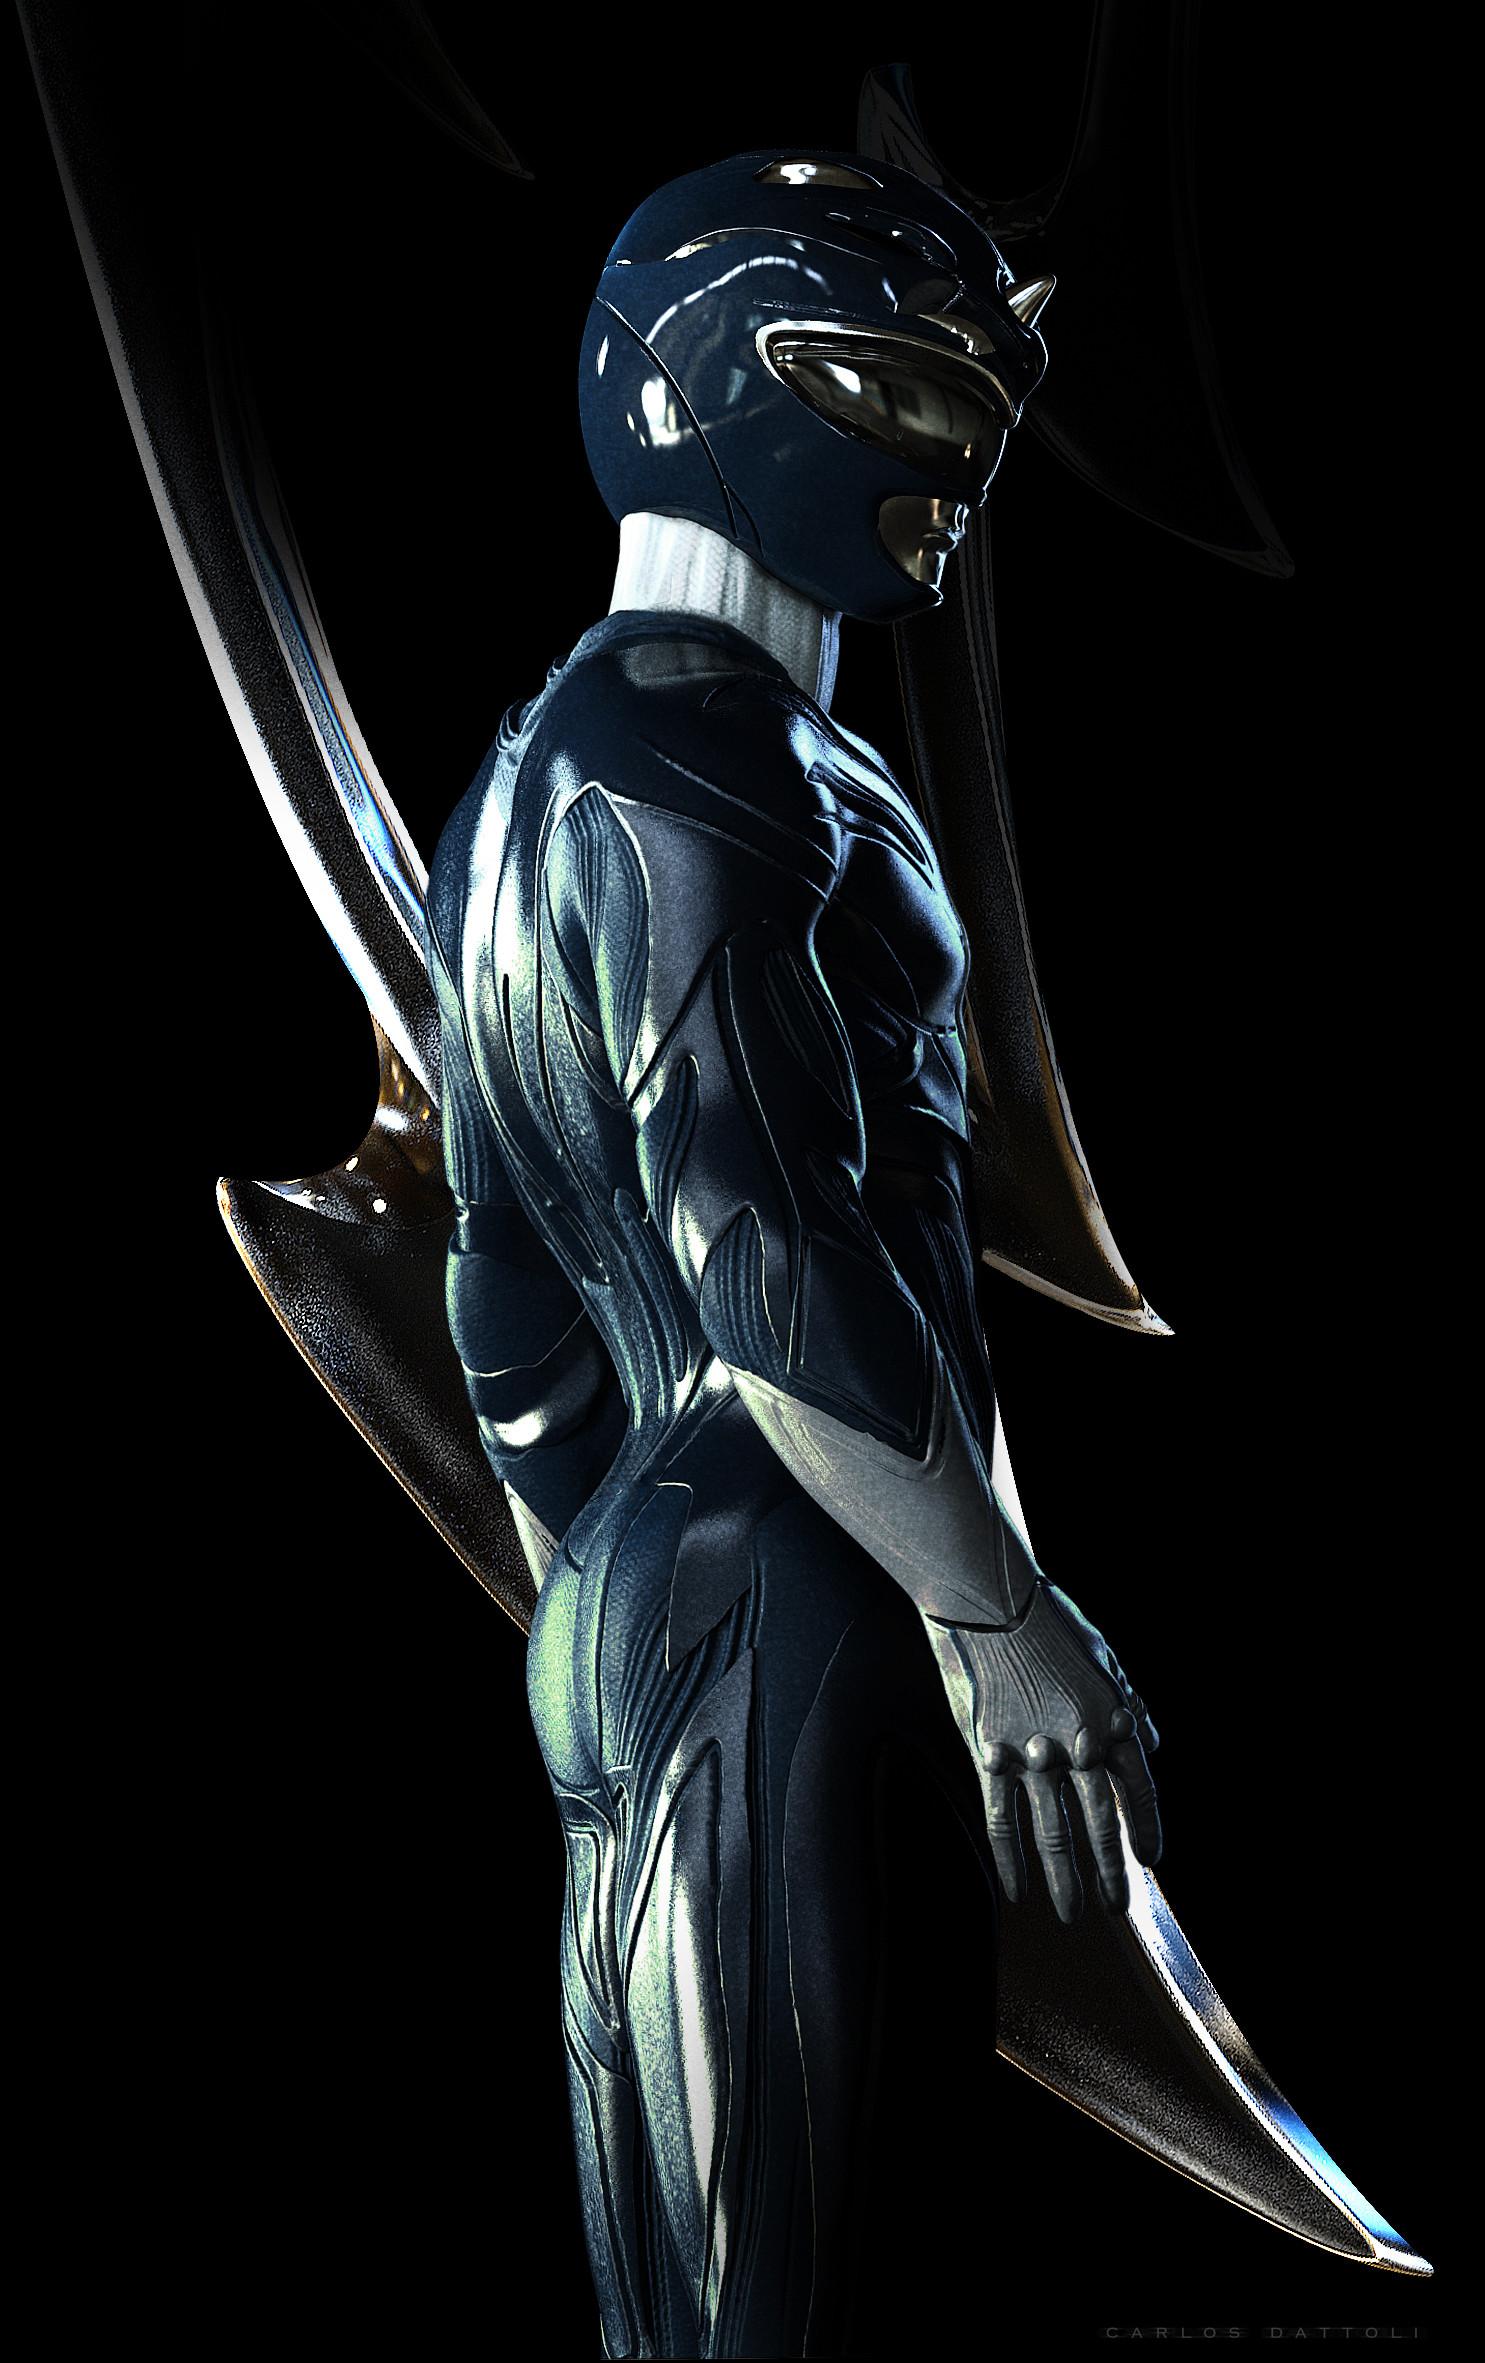 Blue Ranger, Power Rangers Redesign Artwork by Carlos Dattoli